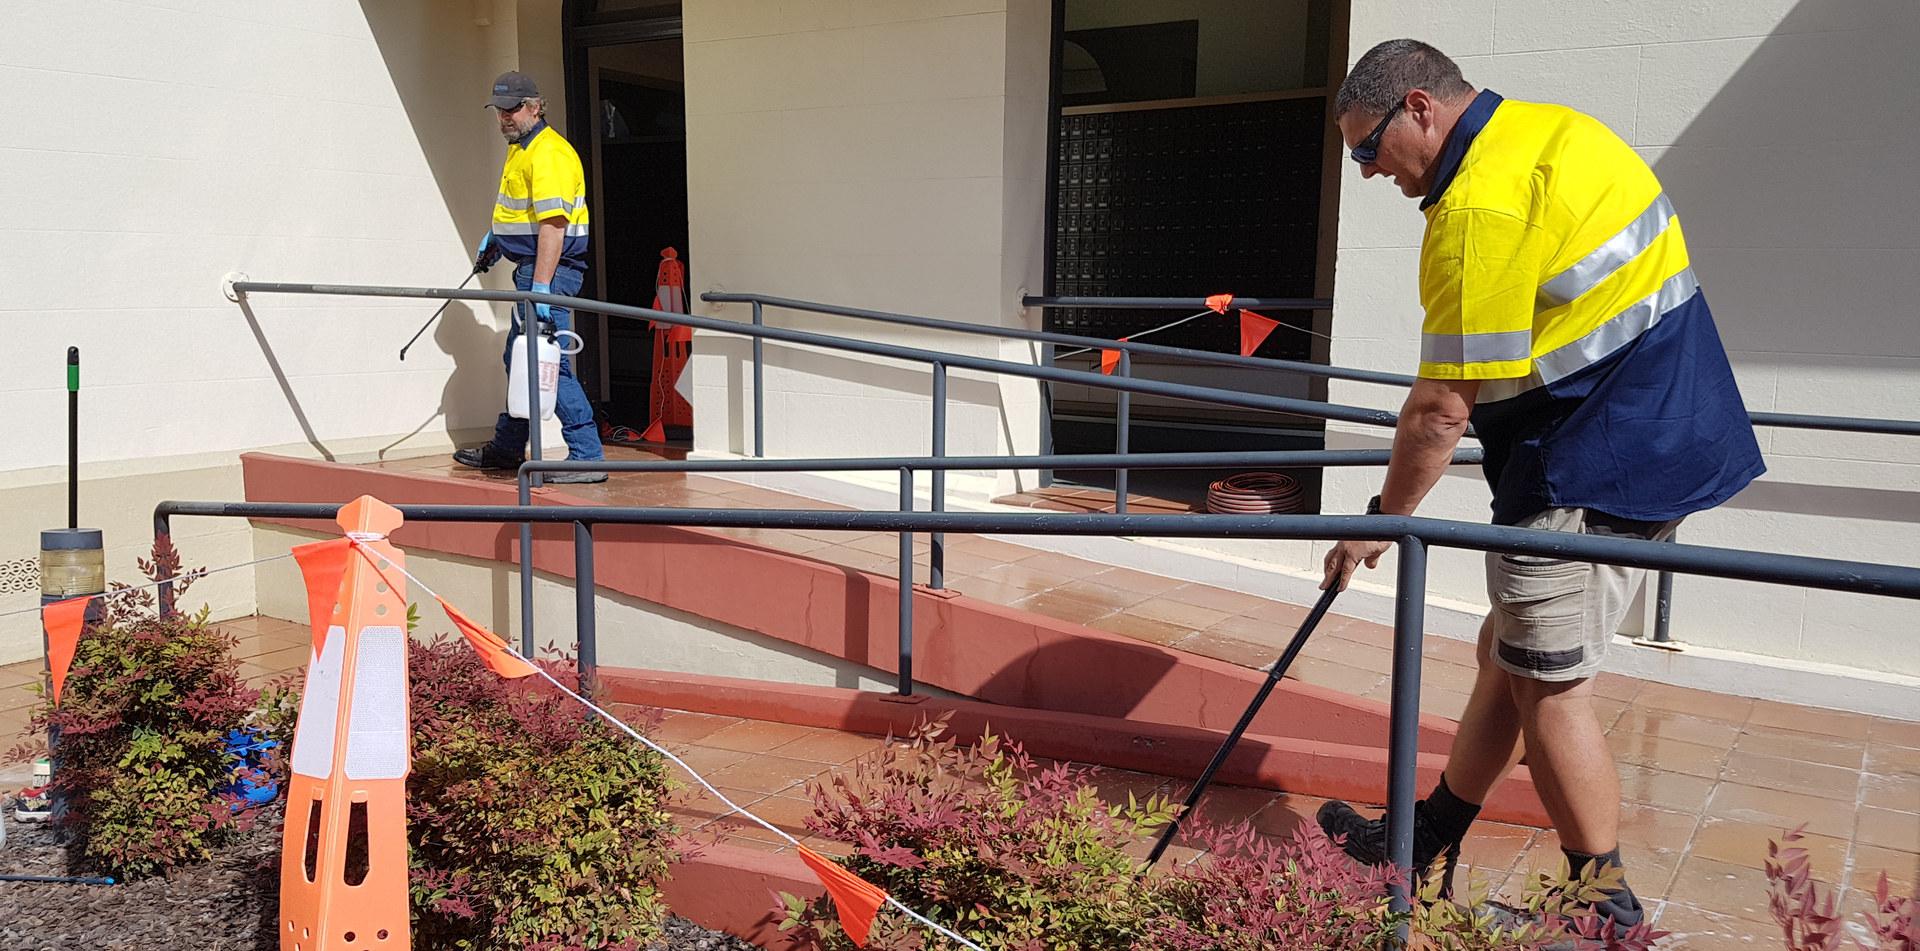 anti slip treatment of stairs and walkways at Bundaberg post office